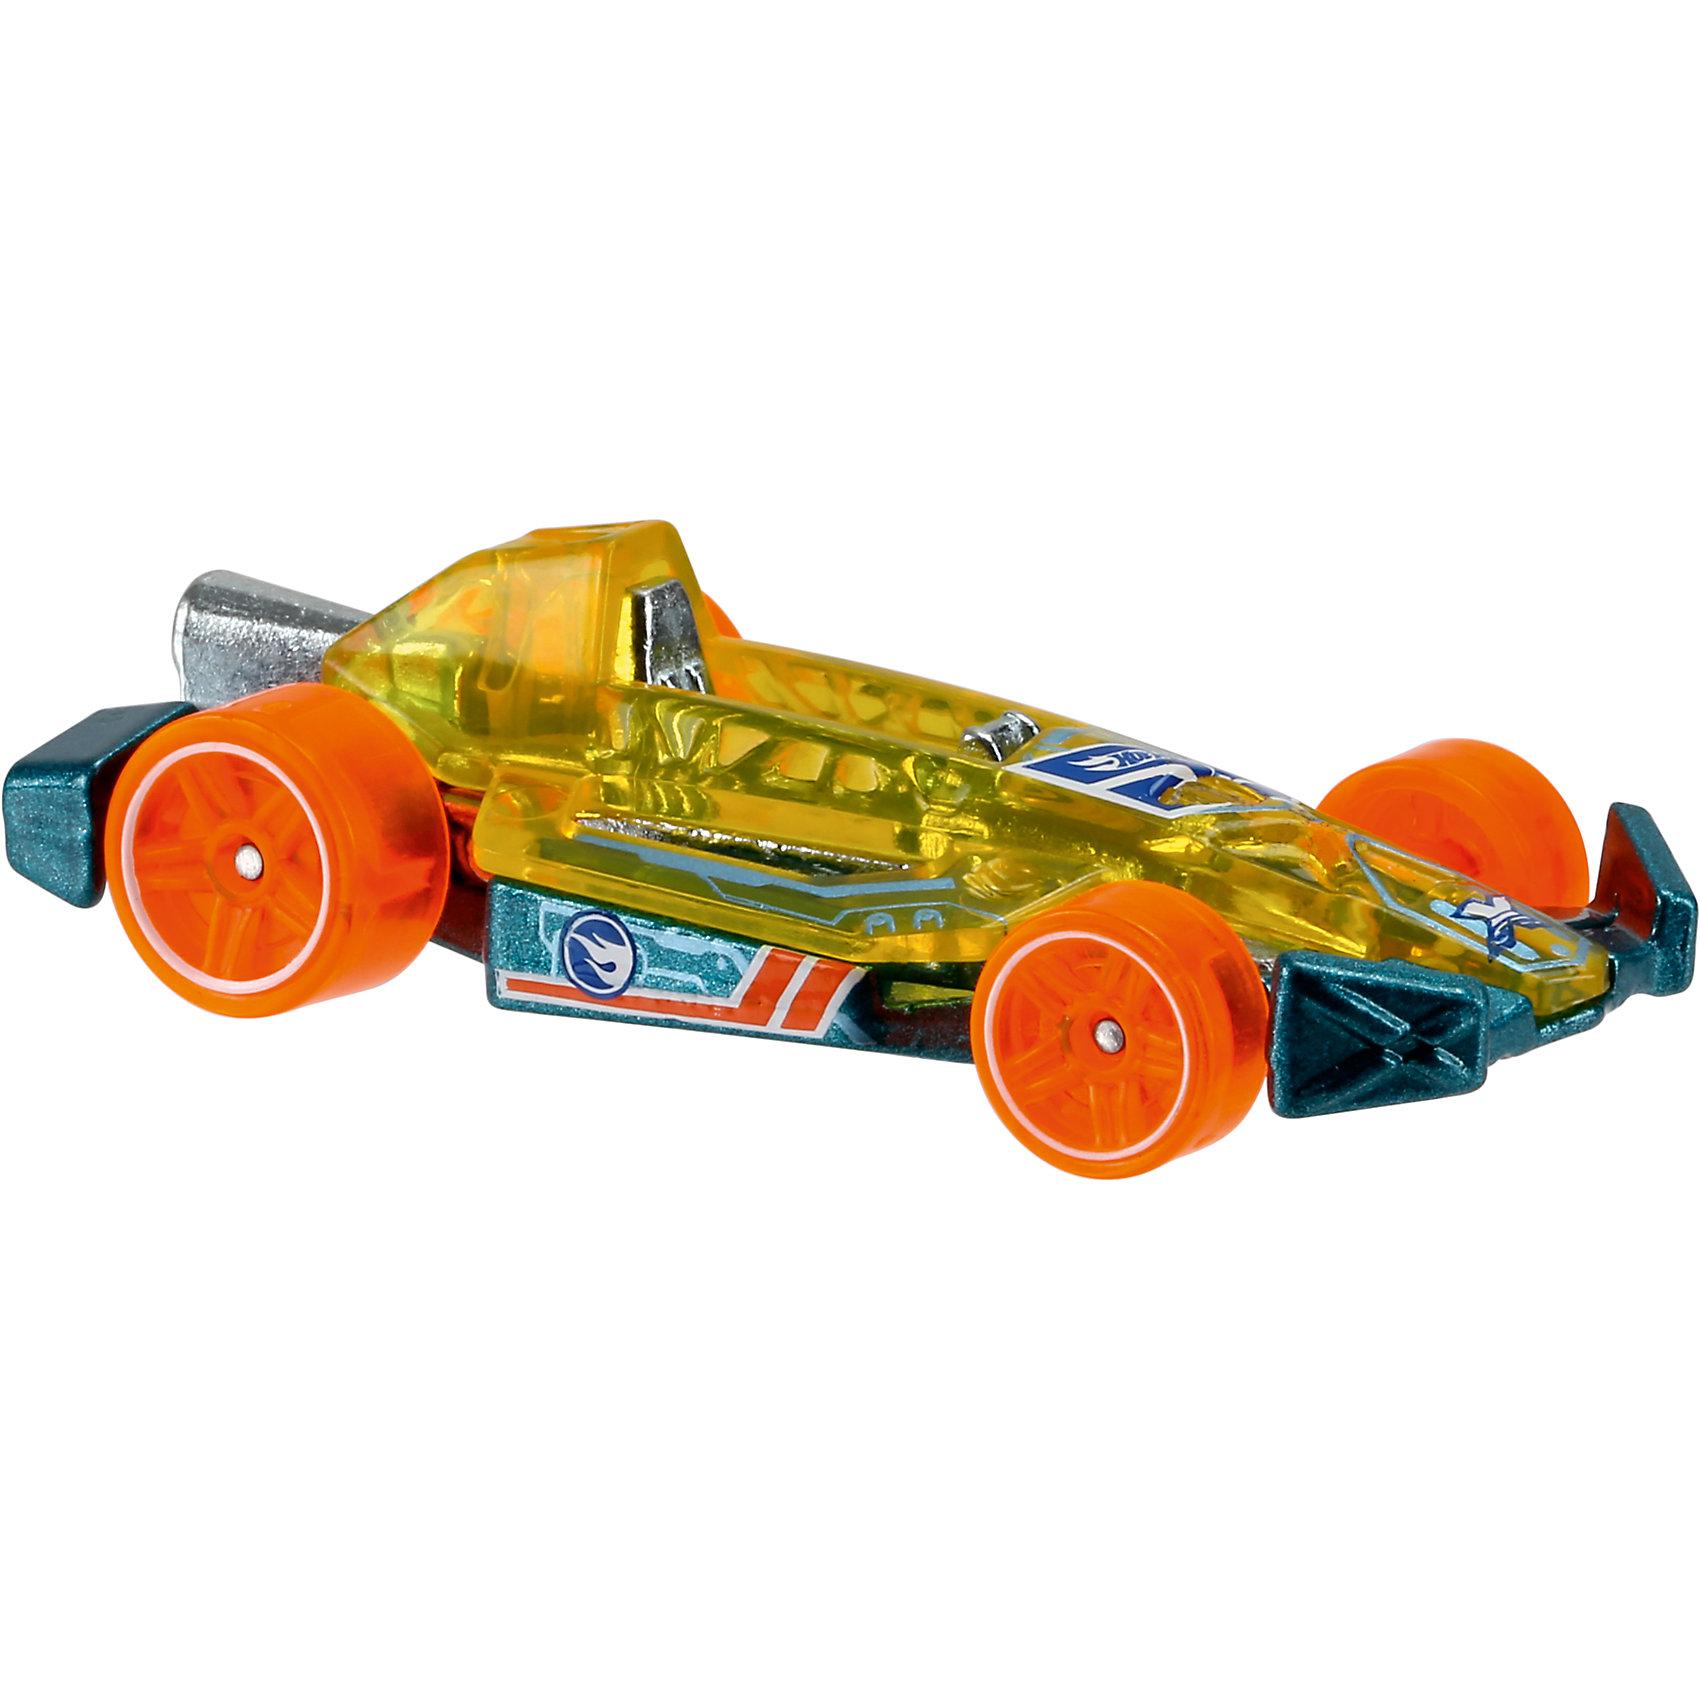 Базовая машинка Hot Wheels, Arrow DynamicПопулярные игрушки<br><br><br>Ширина мм: 110<br>Глубина мм: 45<br>Высота мм: 110<br>Вес г: 30<br>Возраст от месяцев: 36<br>Возраст до месяцев: 96<br>Пол: Мужской<br>Возраст: Детский<br>SKU: 7111060